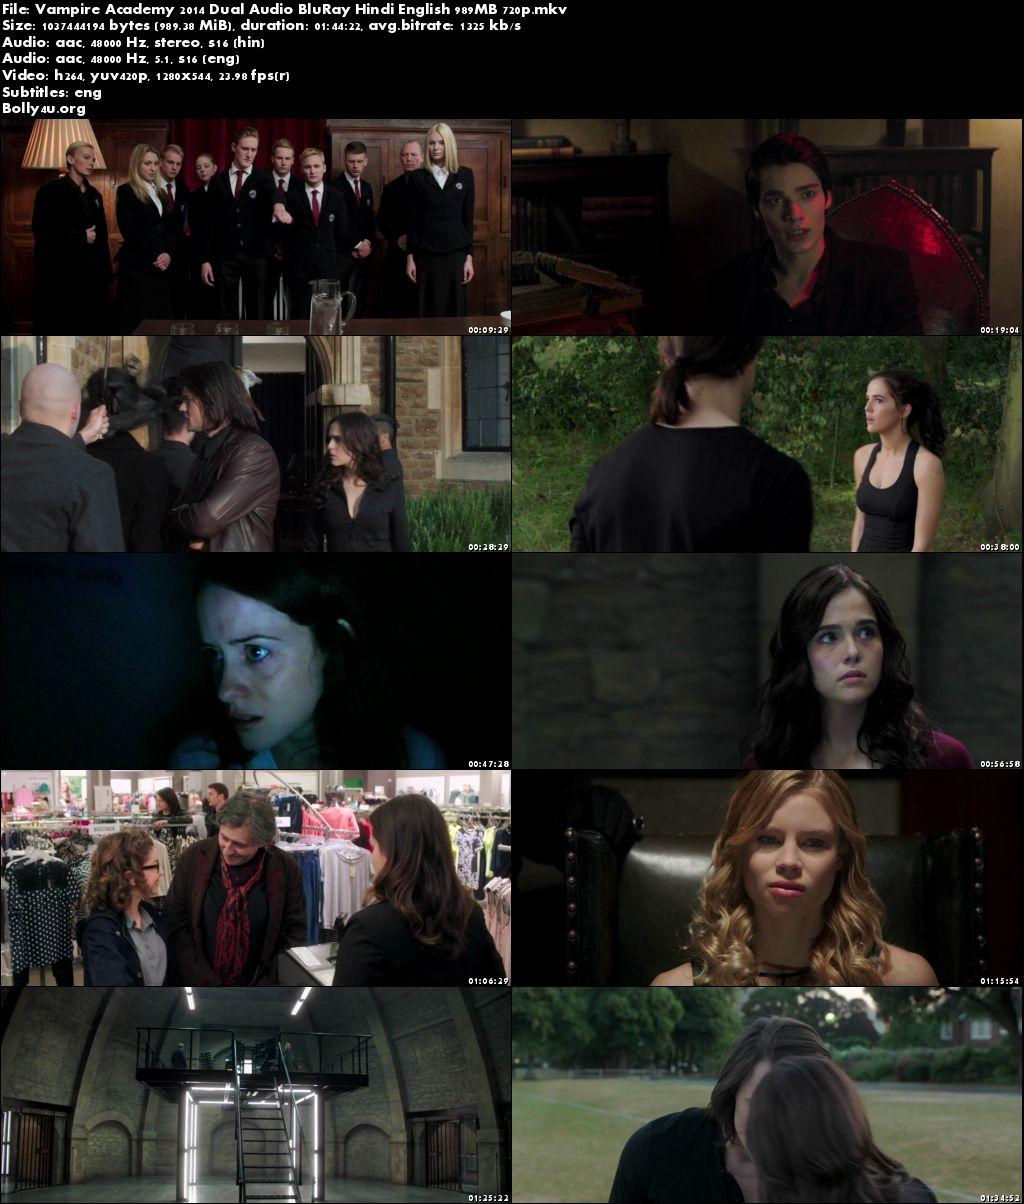 Vampire Academy 2014 BluRay 350MB Hindi Dual Audio 480p Download